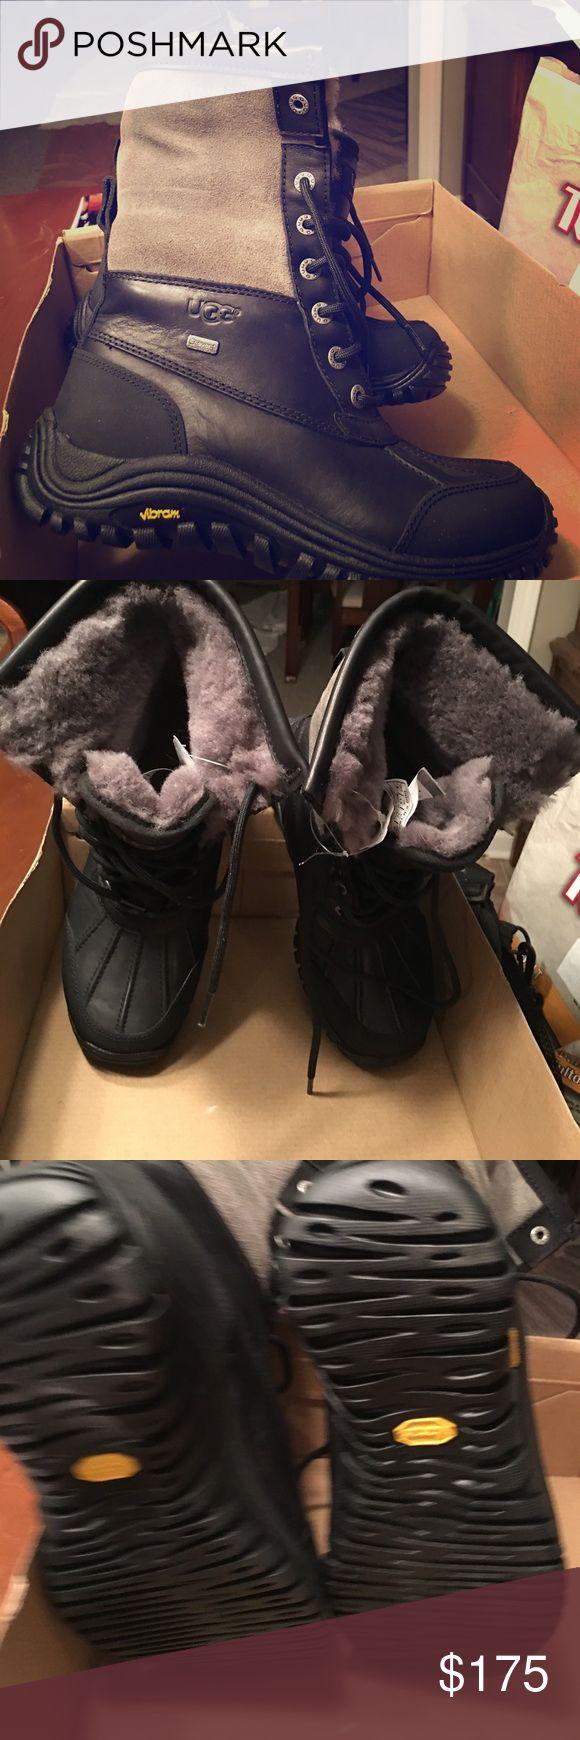 Ugg Adirondack Boot II Ugg Adirondack Boot II, new, never worn. UGG Shoes Winter & Rain Boots